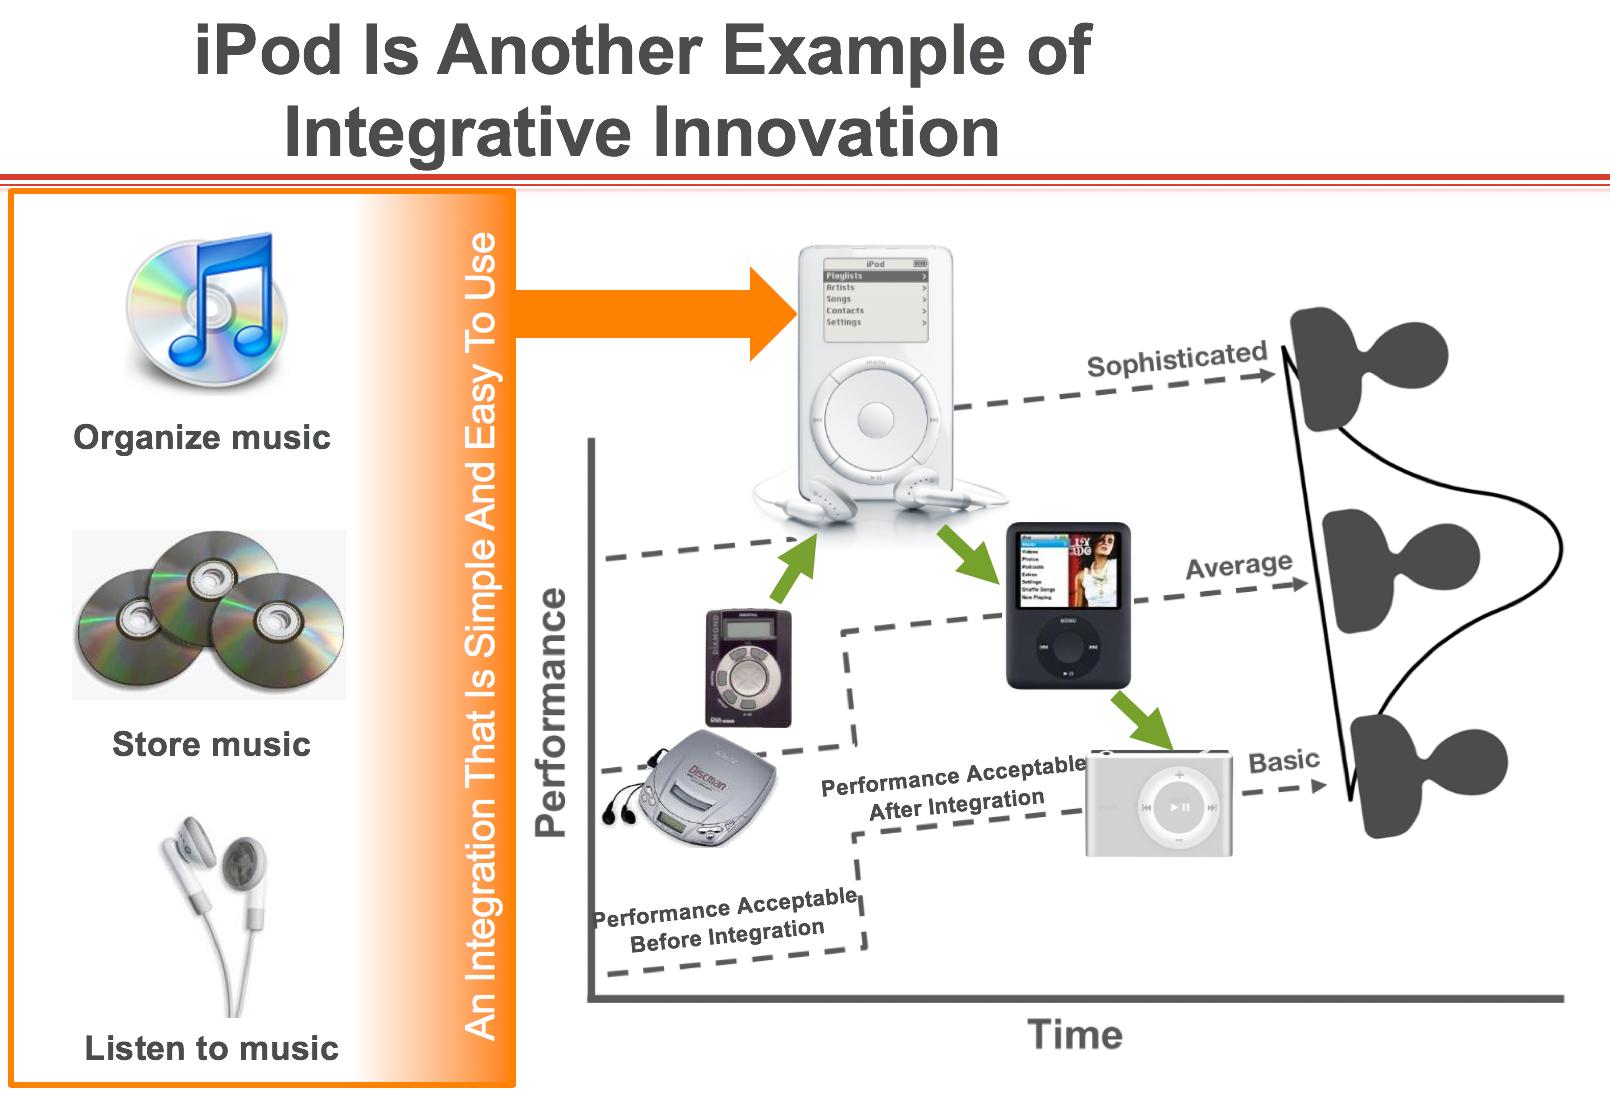 ipod-integrative-innovation